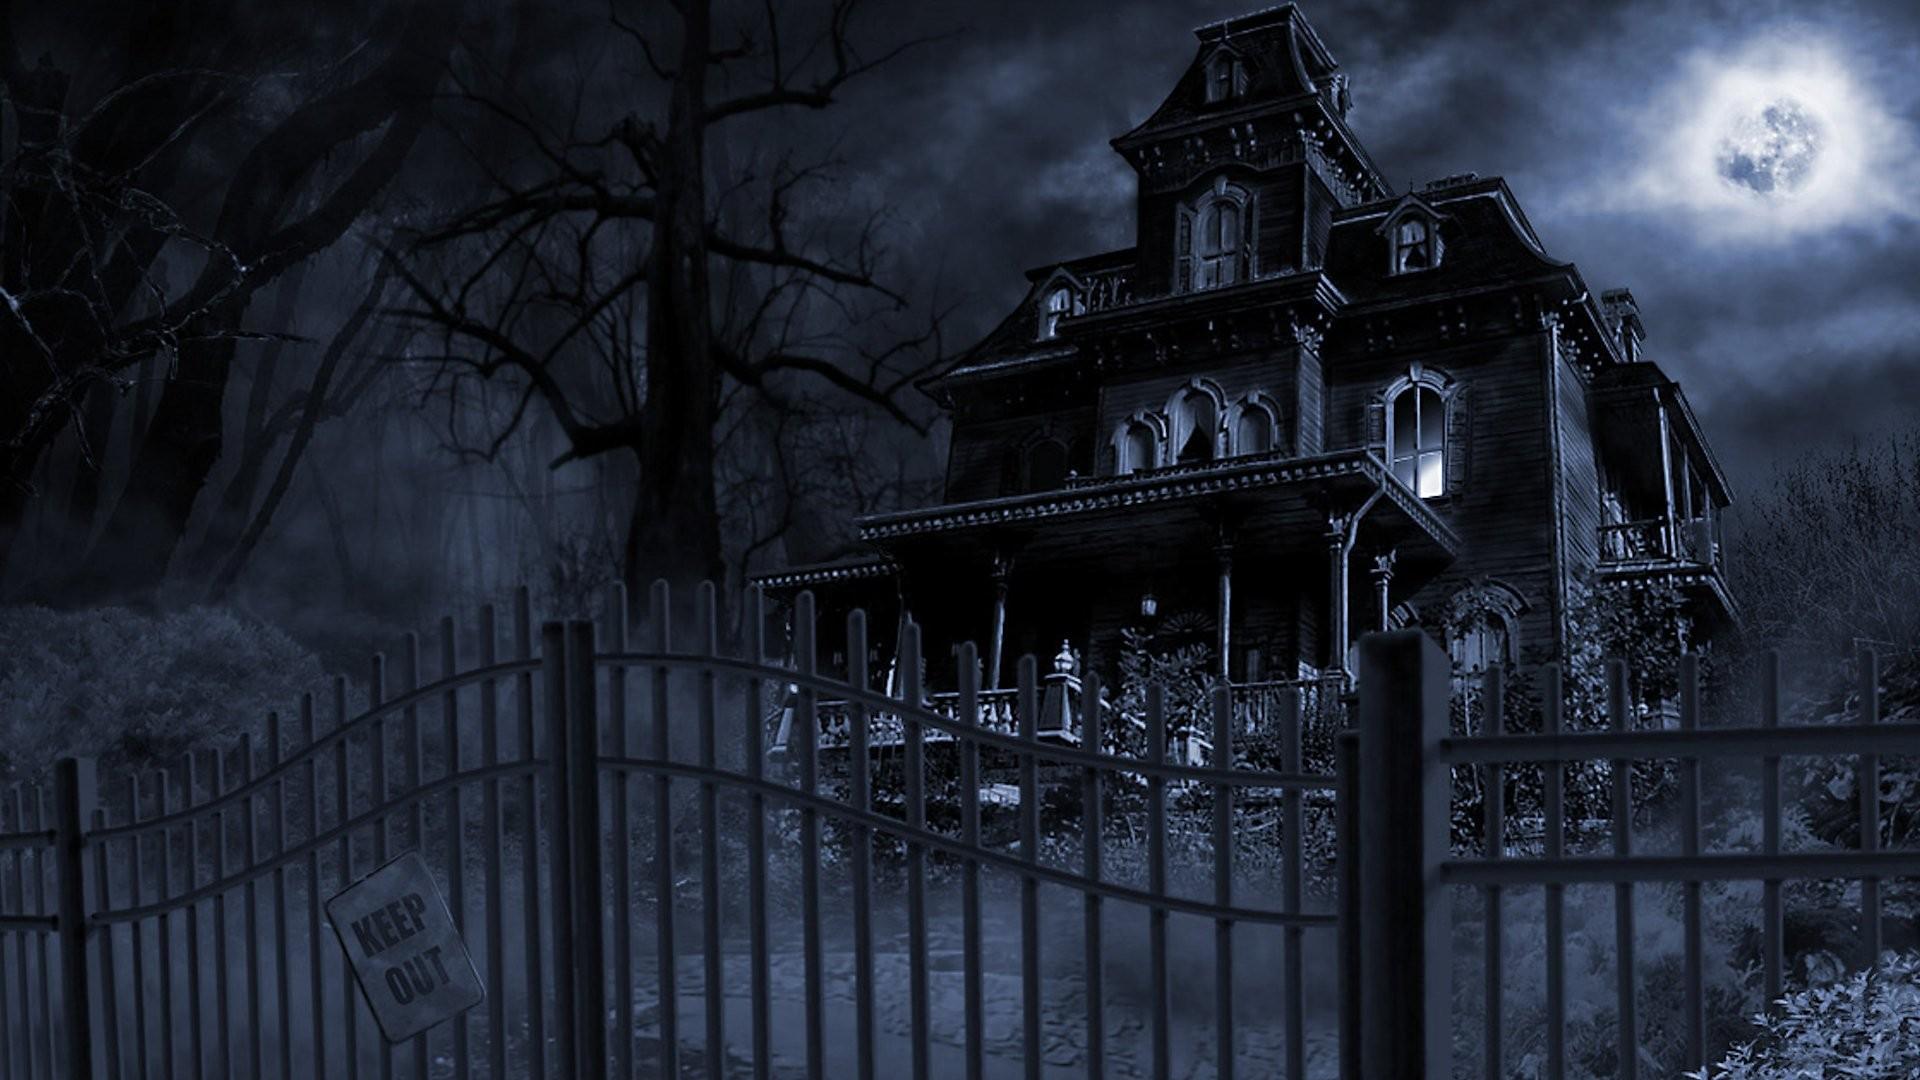 Haunted House wallpaper 1920x1080